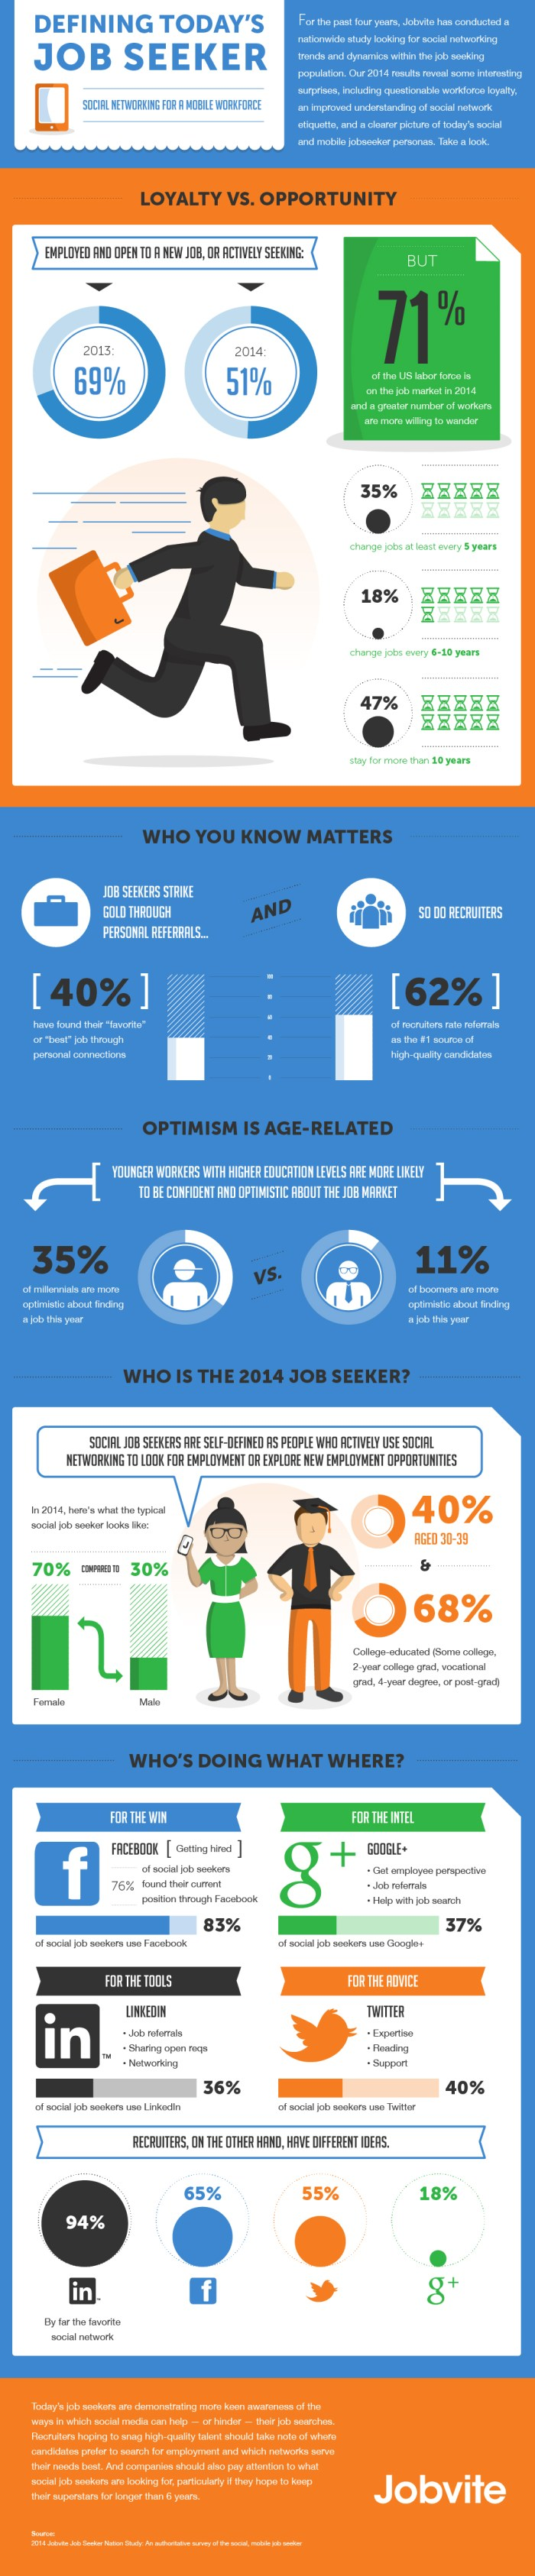 JobSeekerNationInfographic1